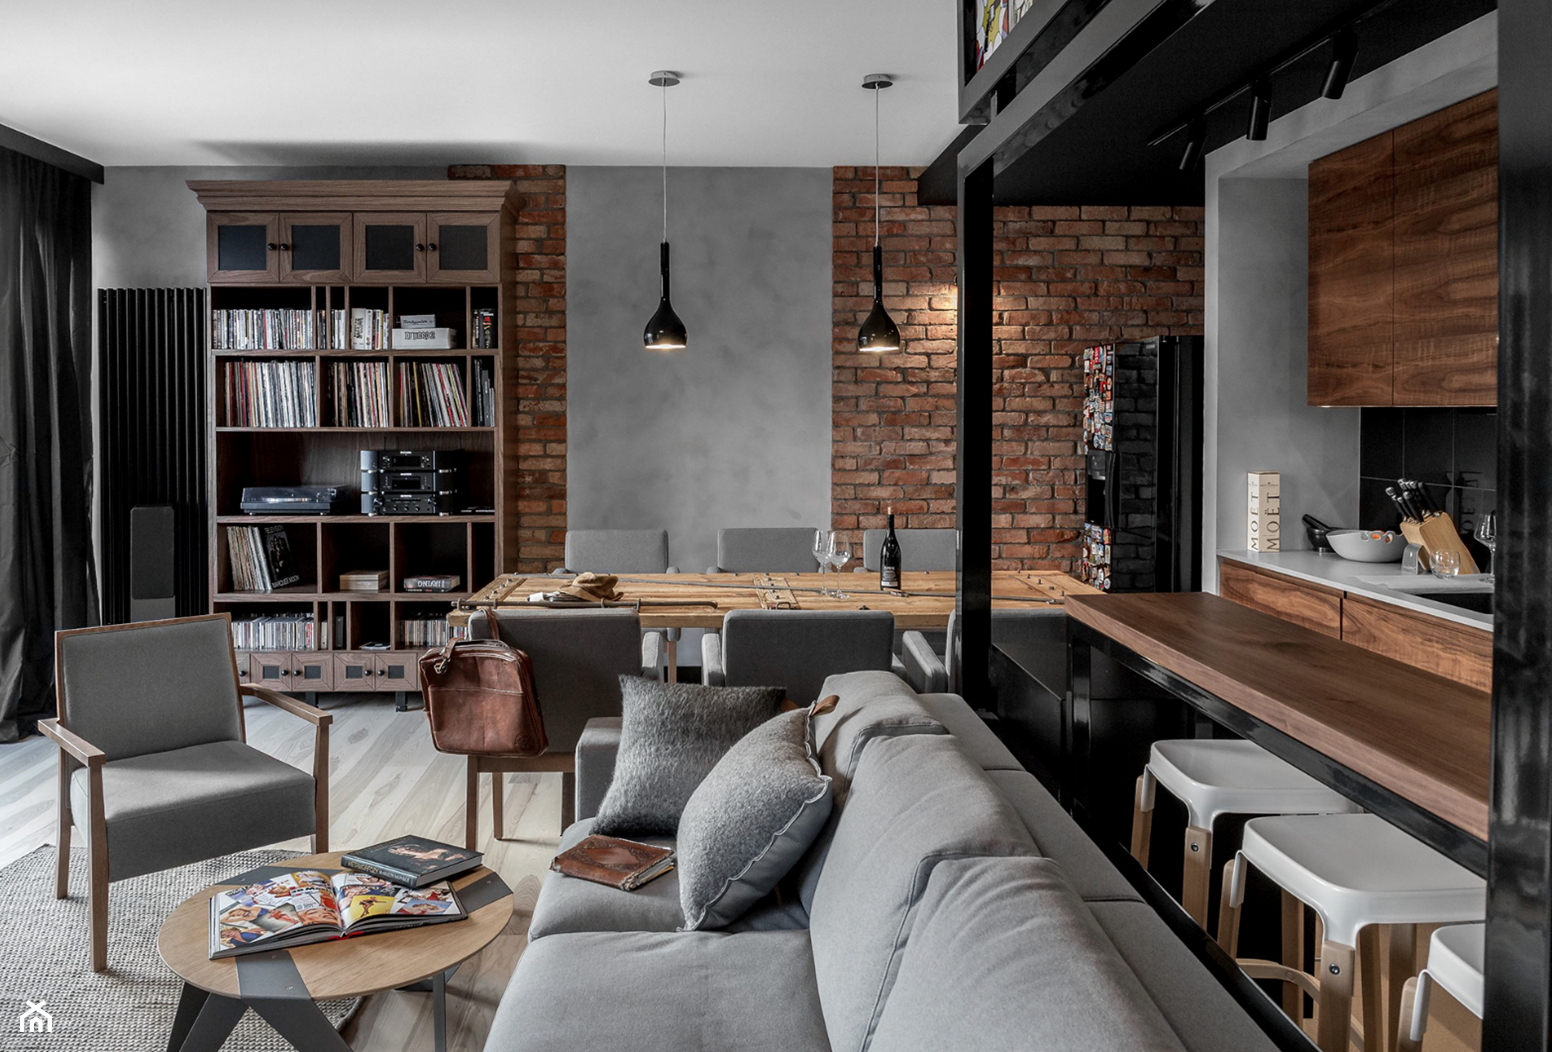 Salon Z Kuchnia Aranzacje Inspiracje I Pomysly Na Modny Wystroj 2020 Loft Interiors Loft Design Brick Interior